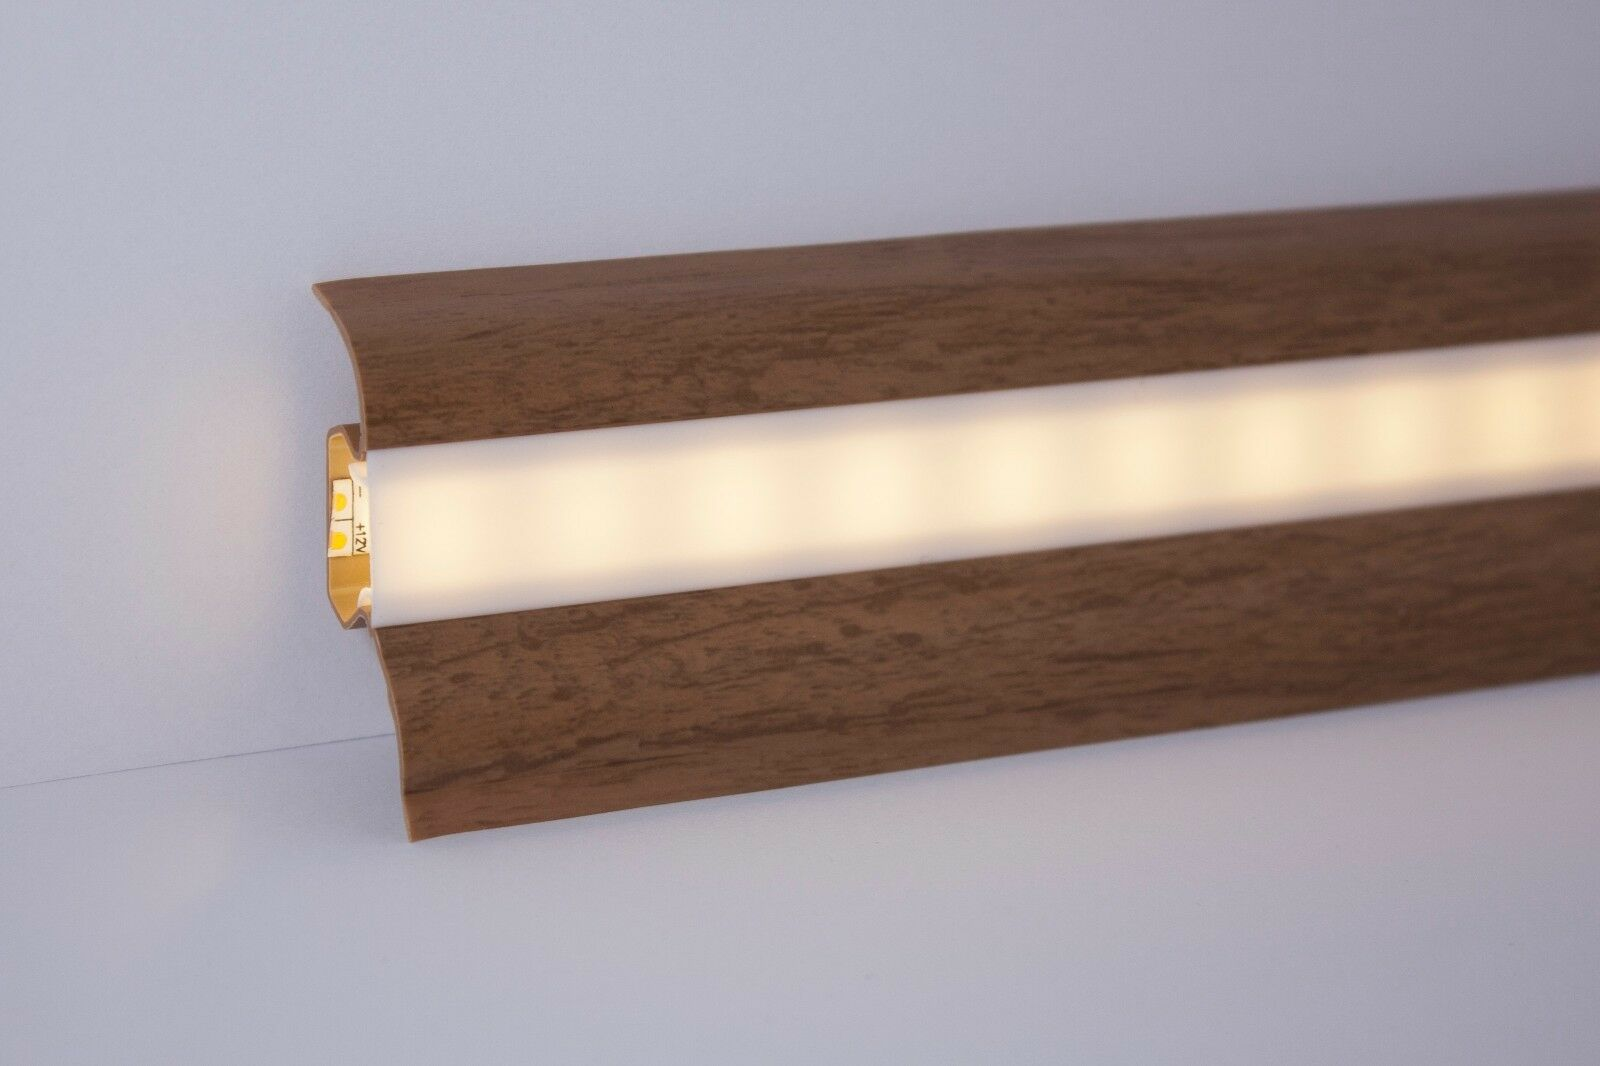 Innenecke 52mm PVC Schilfroh hell Laminatleisten Fussleisten aus Kunststoff PVC Laminat Dekore Fu/ßleisten DQ-PP